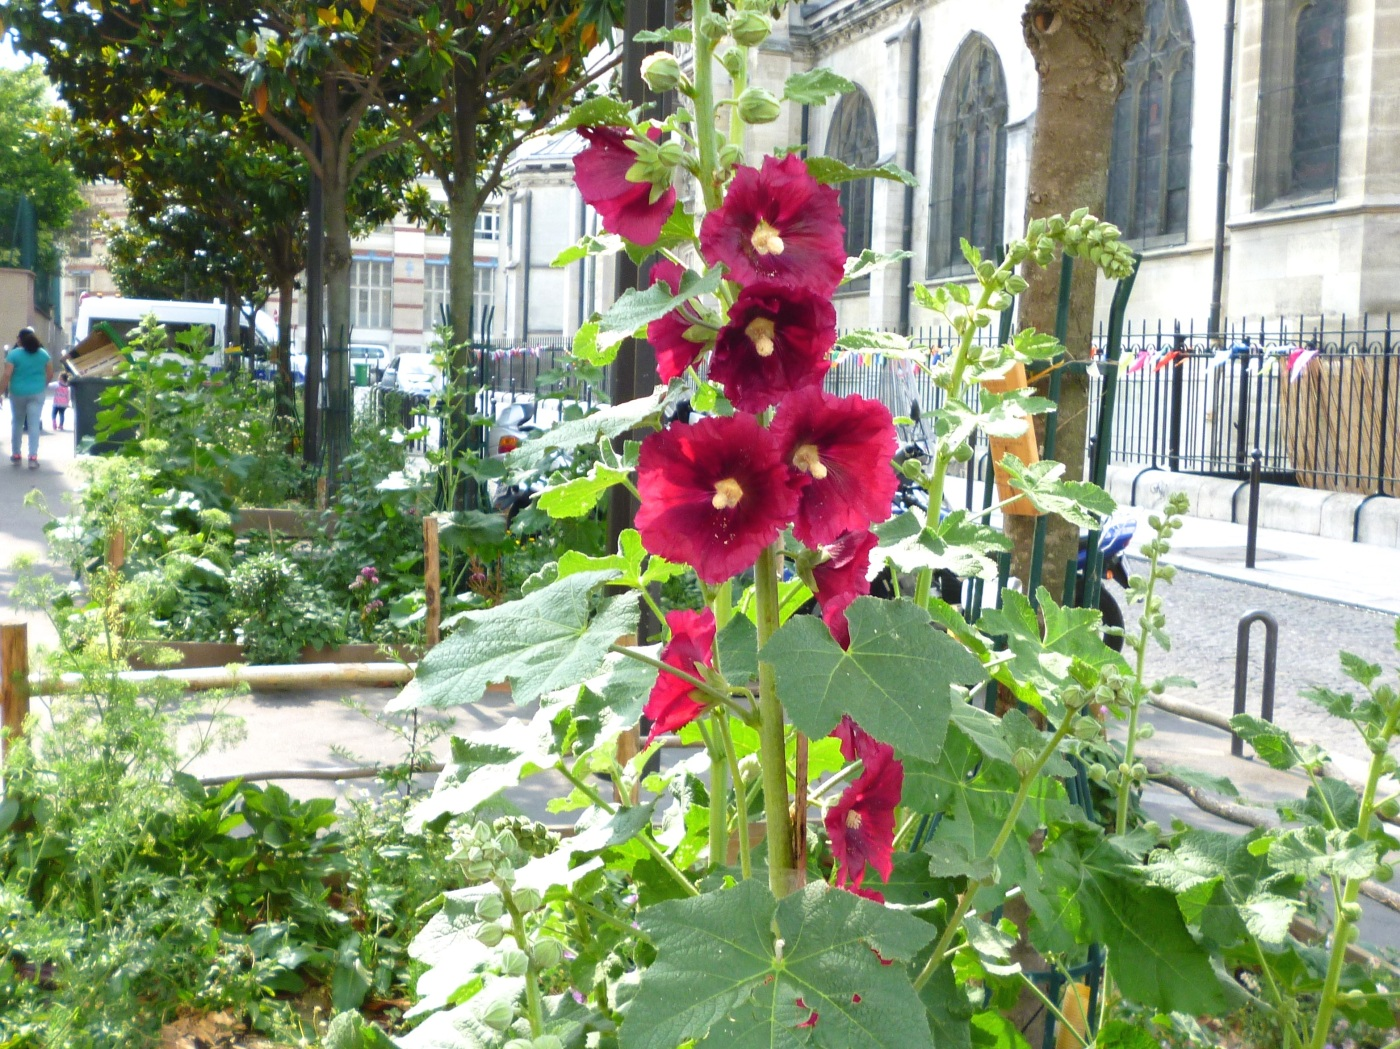 Hollyhock community garden